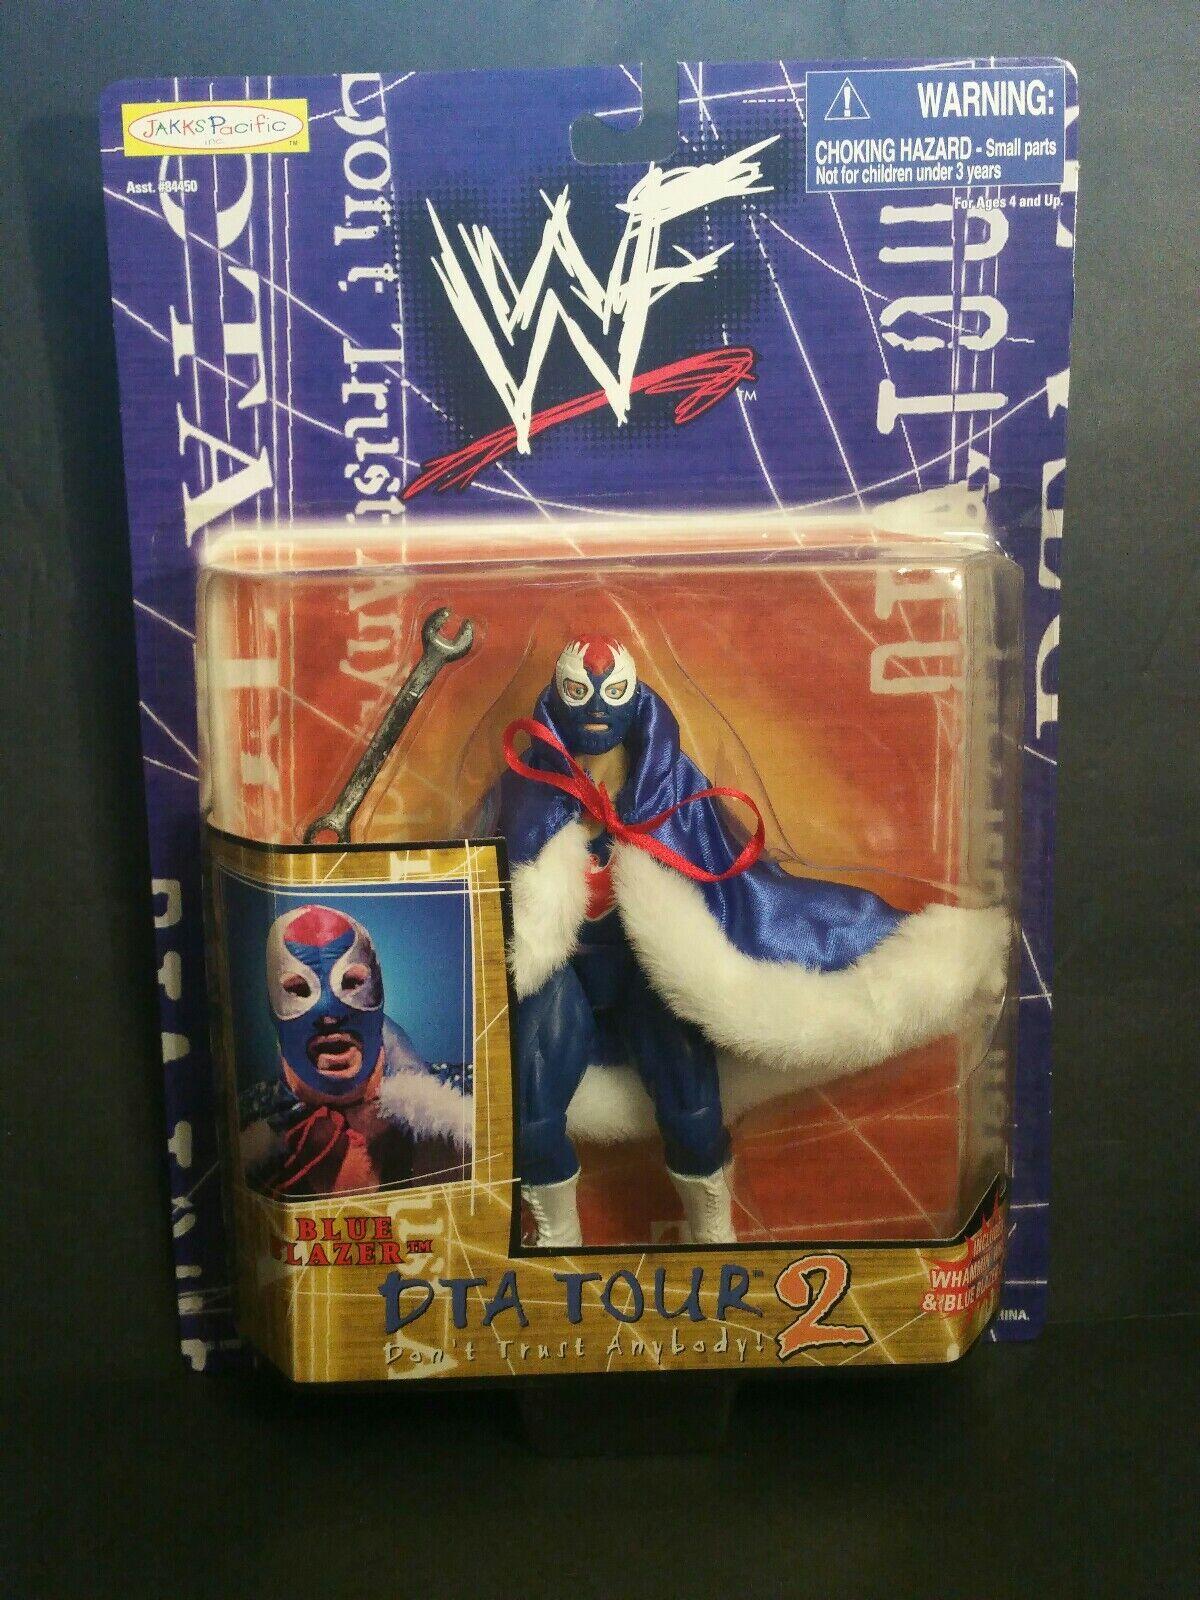 punto de venta en línea WWF DTA TOUR Blazer Azul Azul Azul 2 figura de acción (107) (3-12)  servicio de primera clase